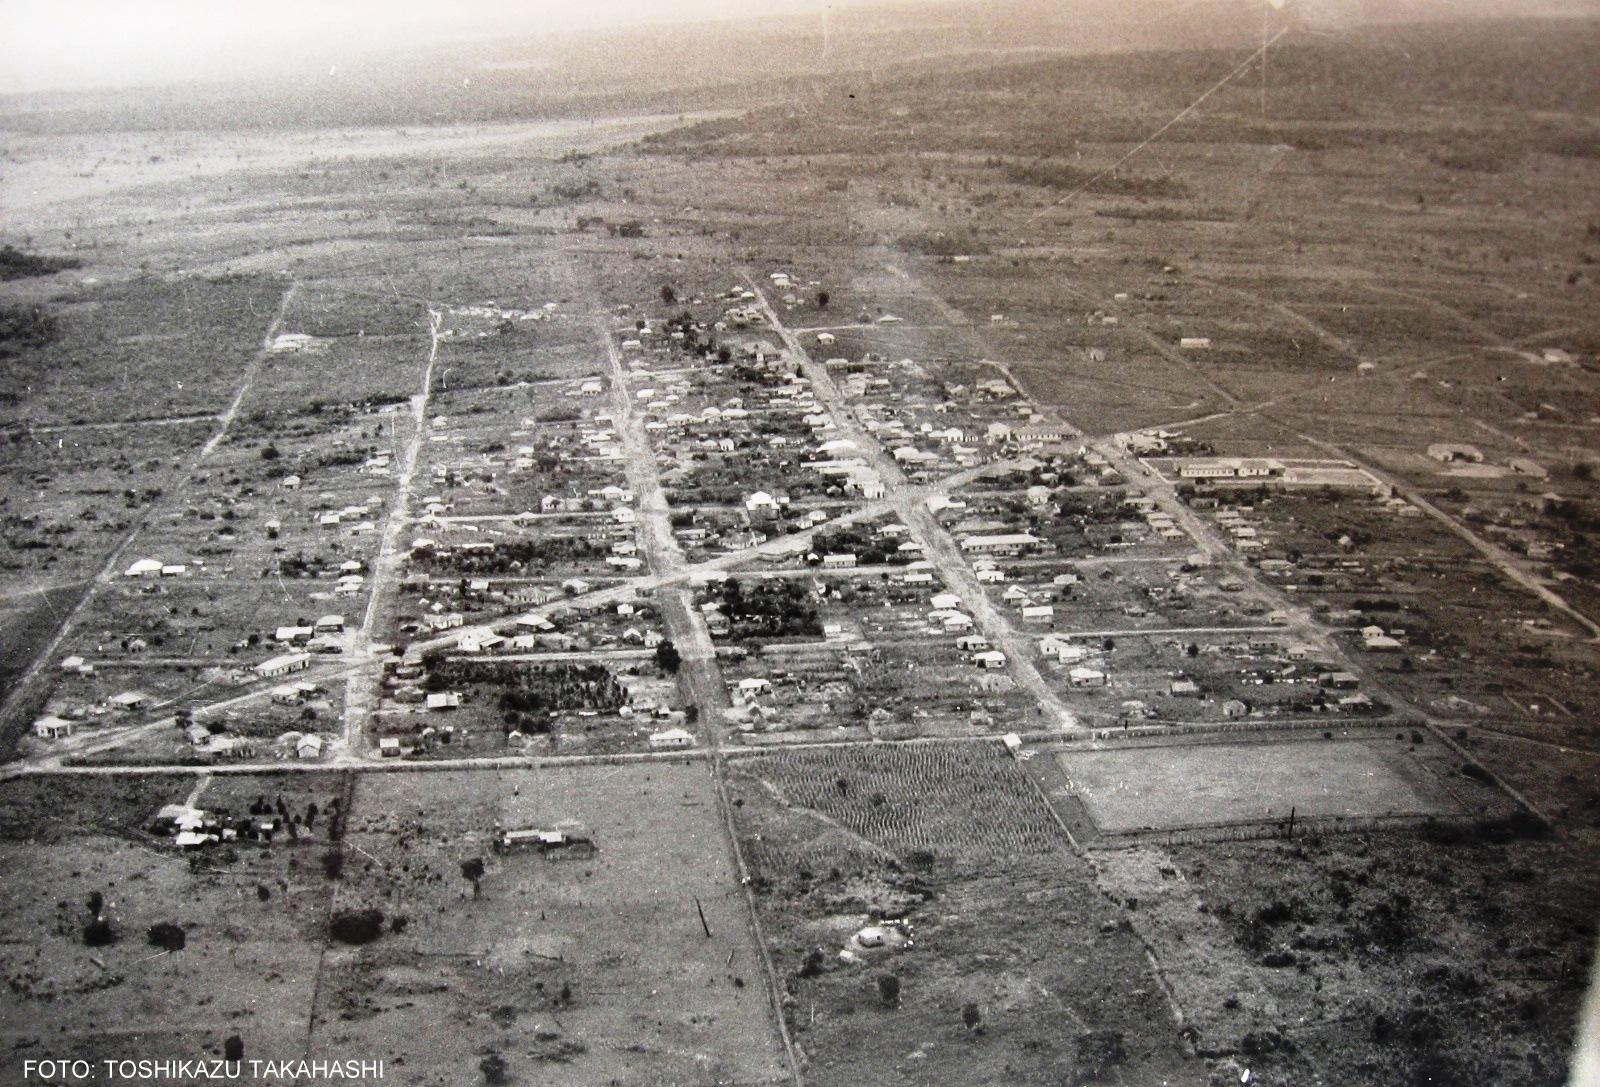 Em 1950, Paranavaí ainda era distrito de Mandaguari (Foto: Toshikazu Takahashi)